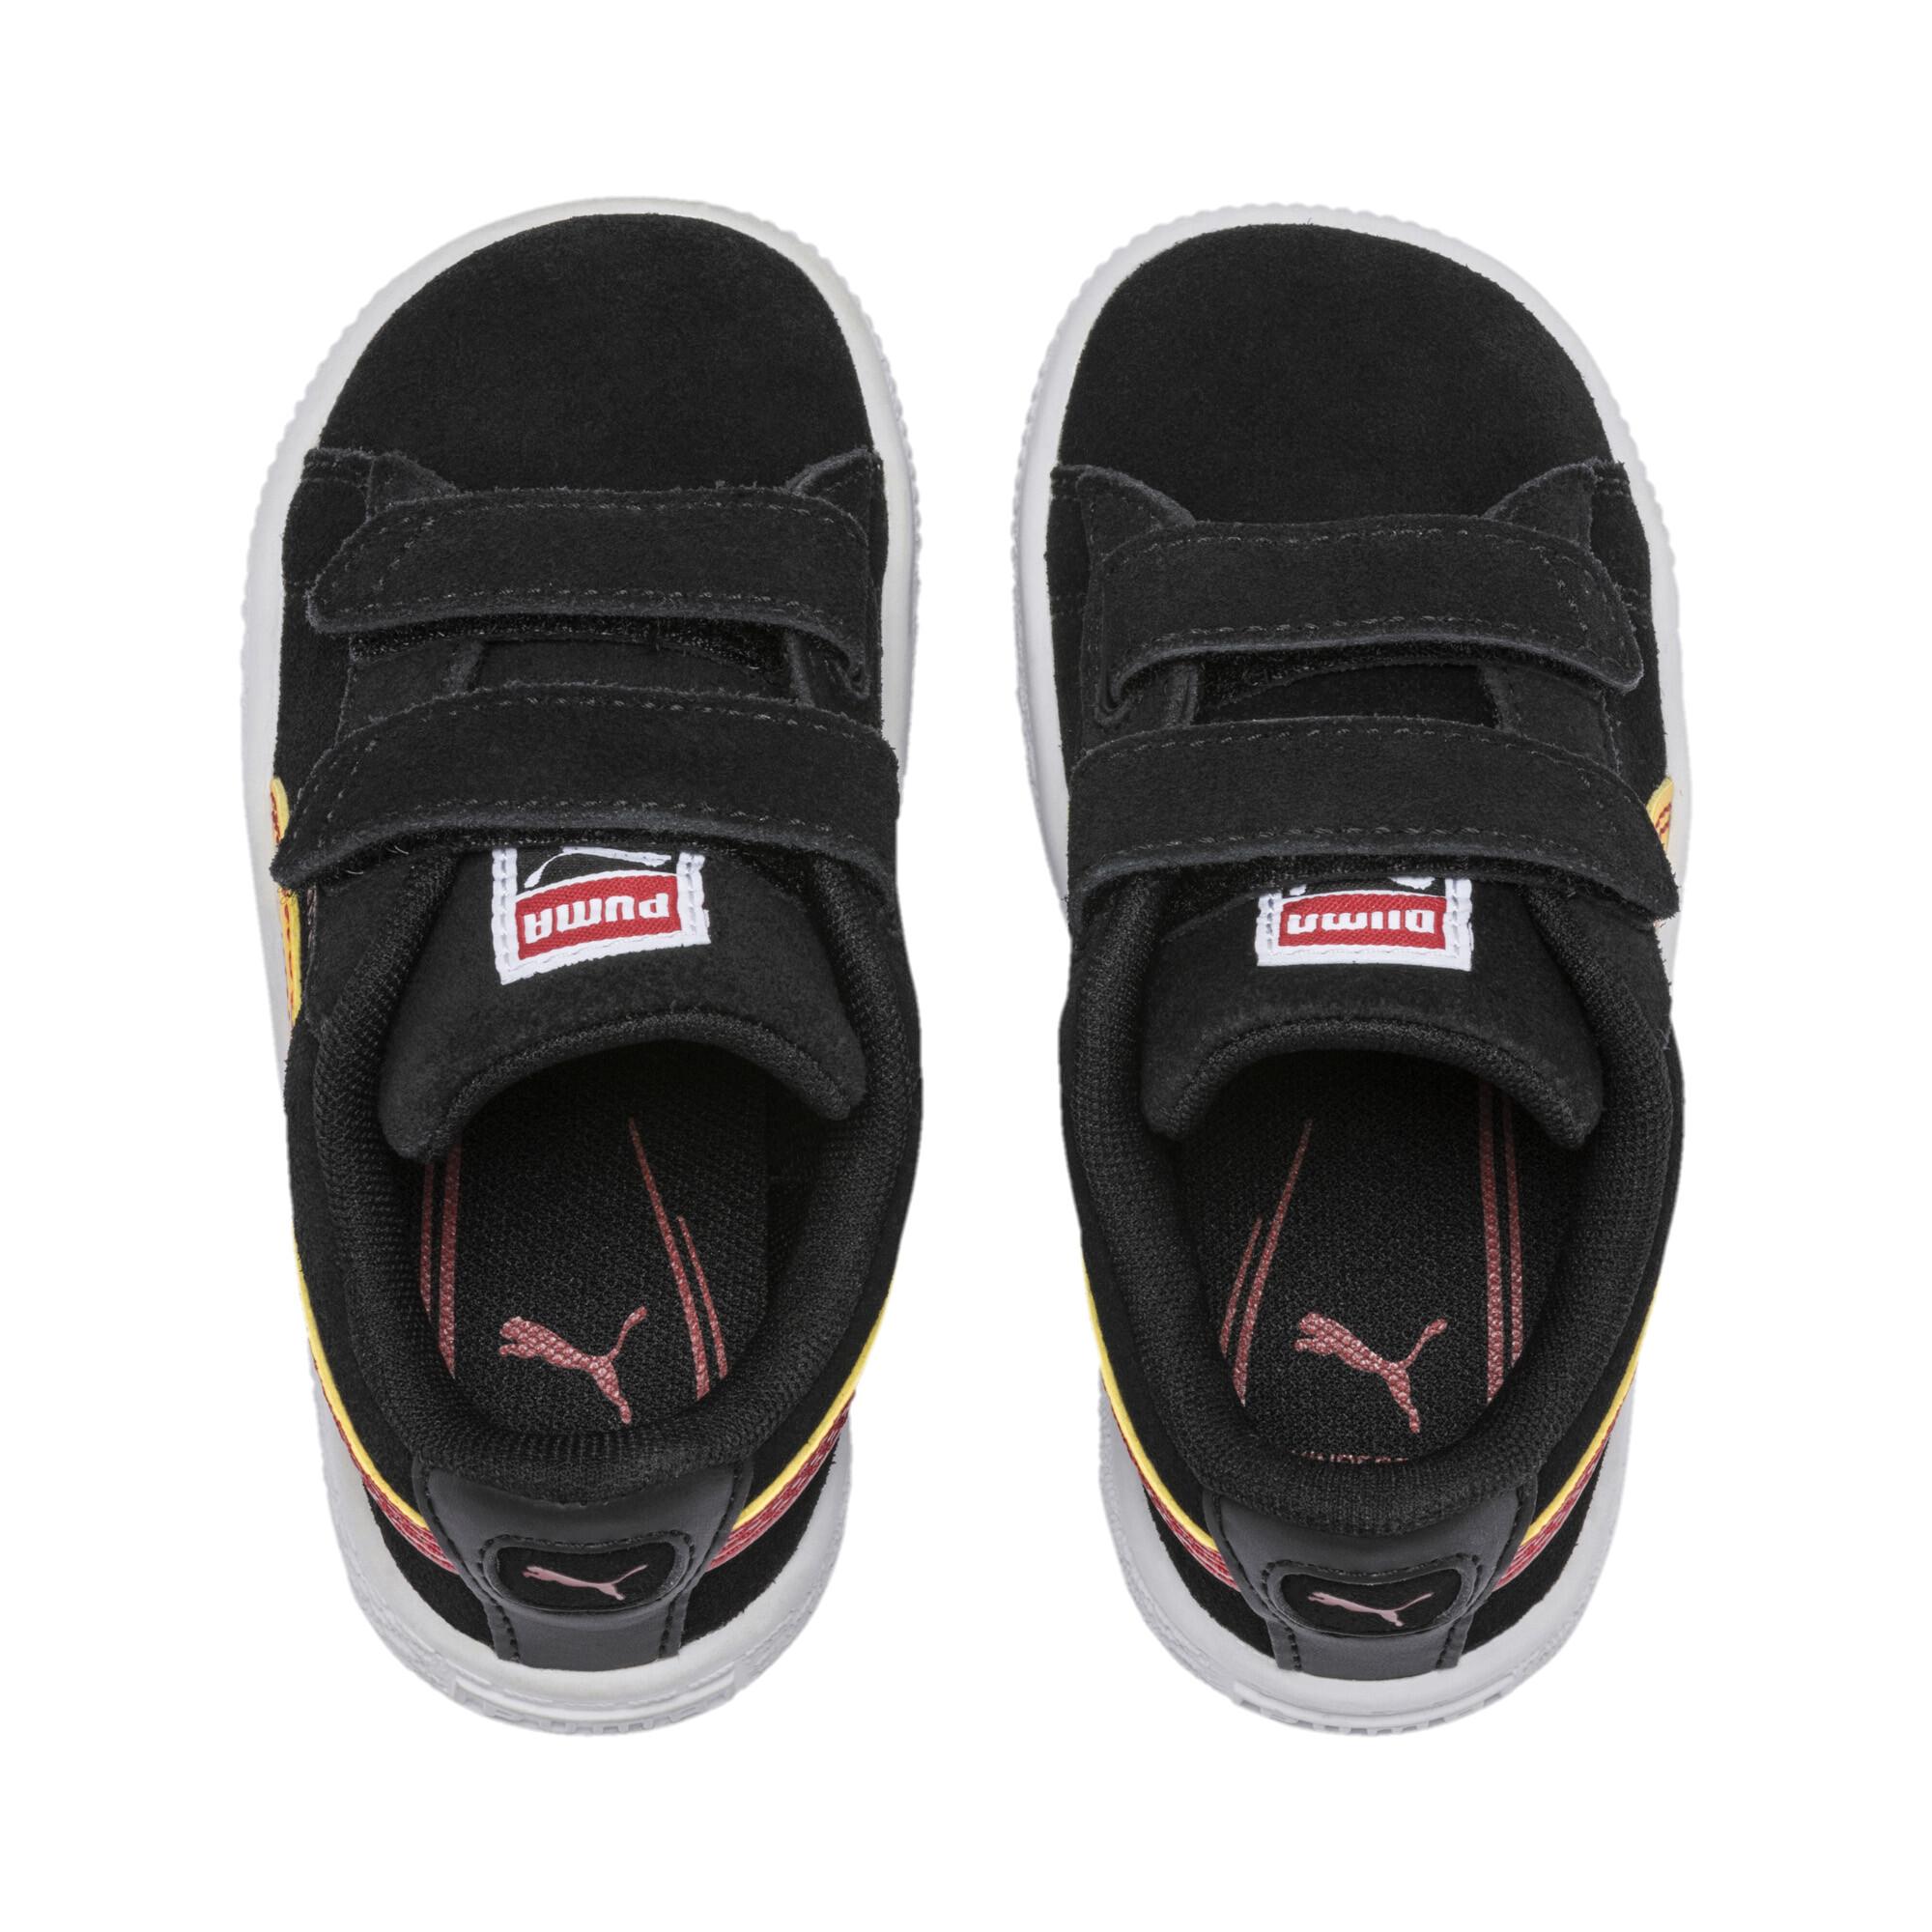 PUMA-Suede-Classic-Lightning-Toddler-Shoes-Boys-Shoe-Kids thumbnail 13